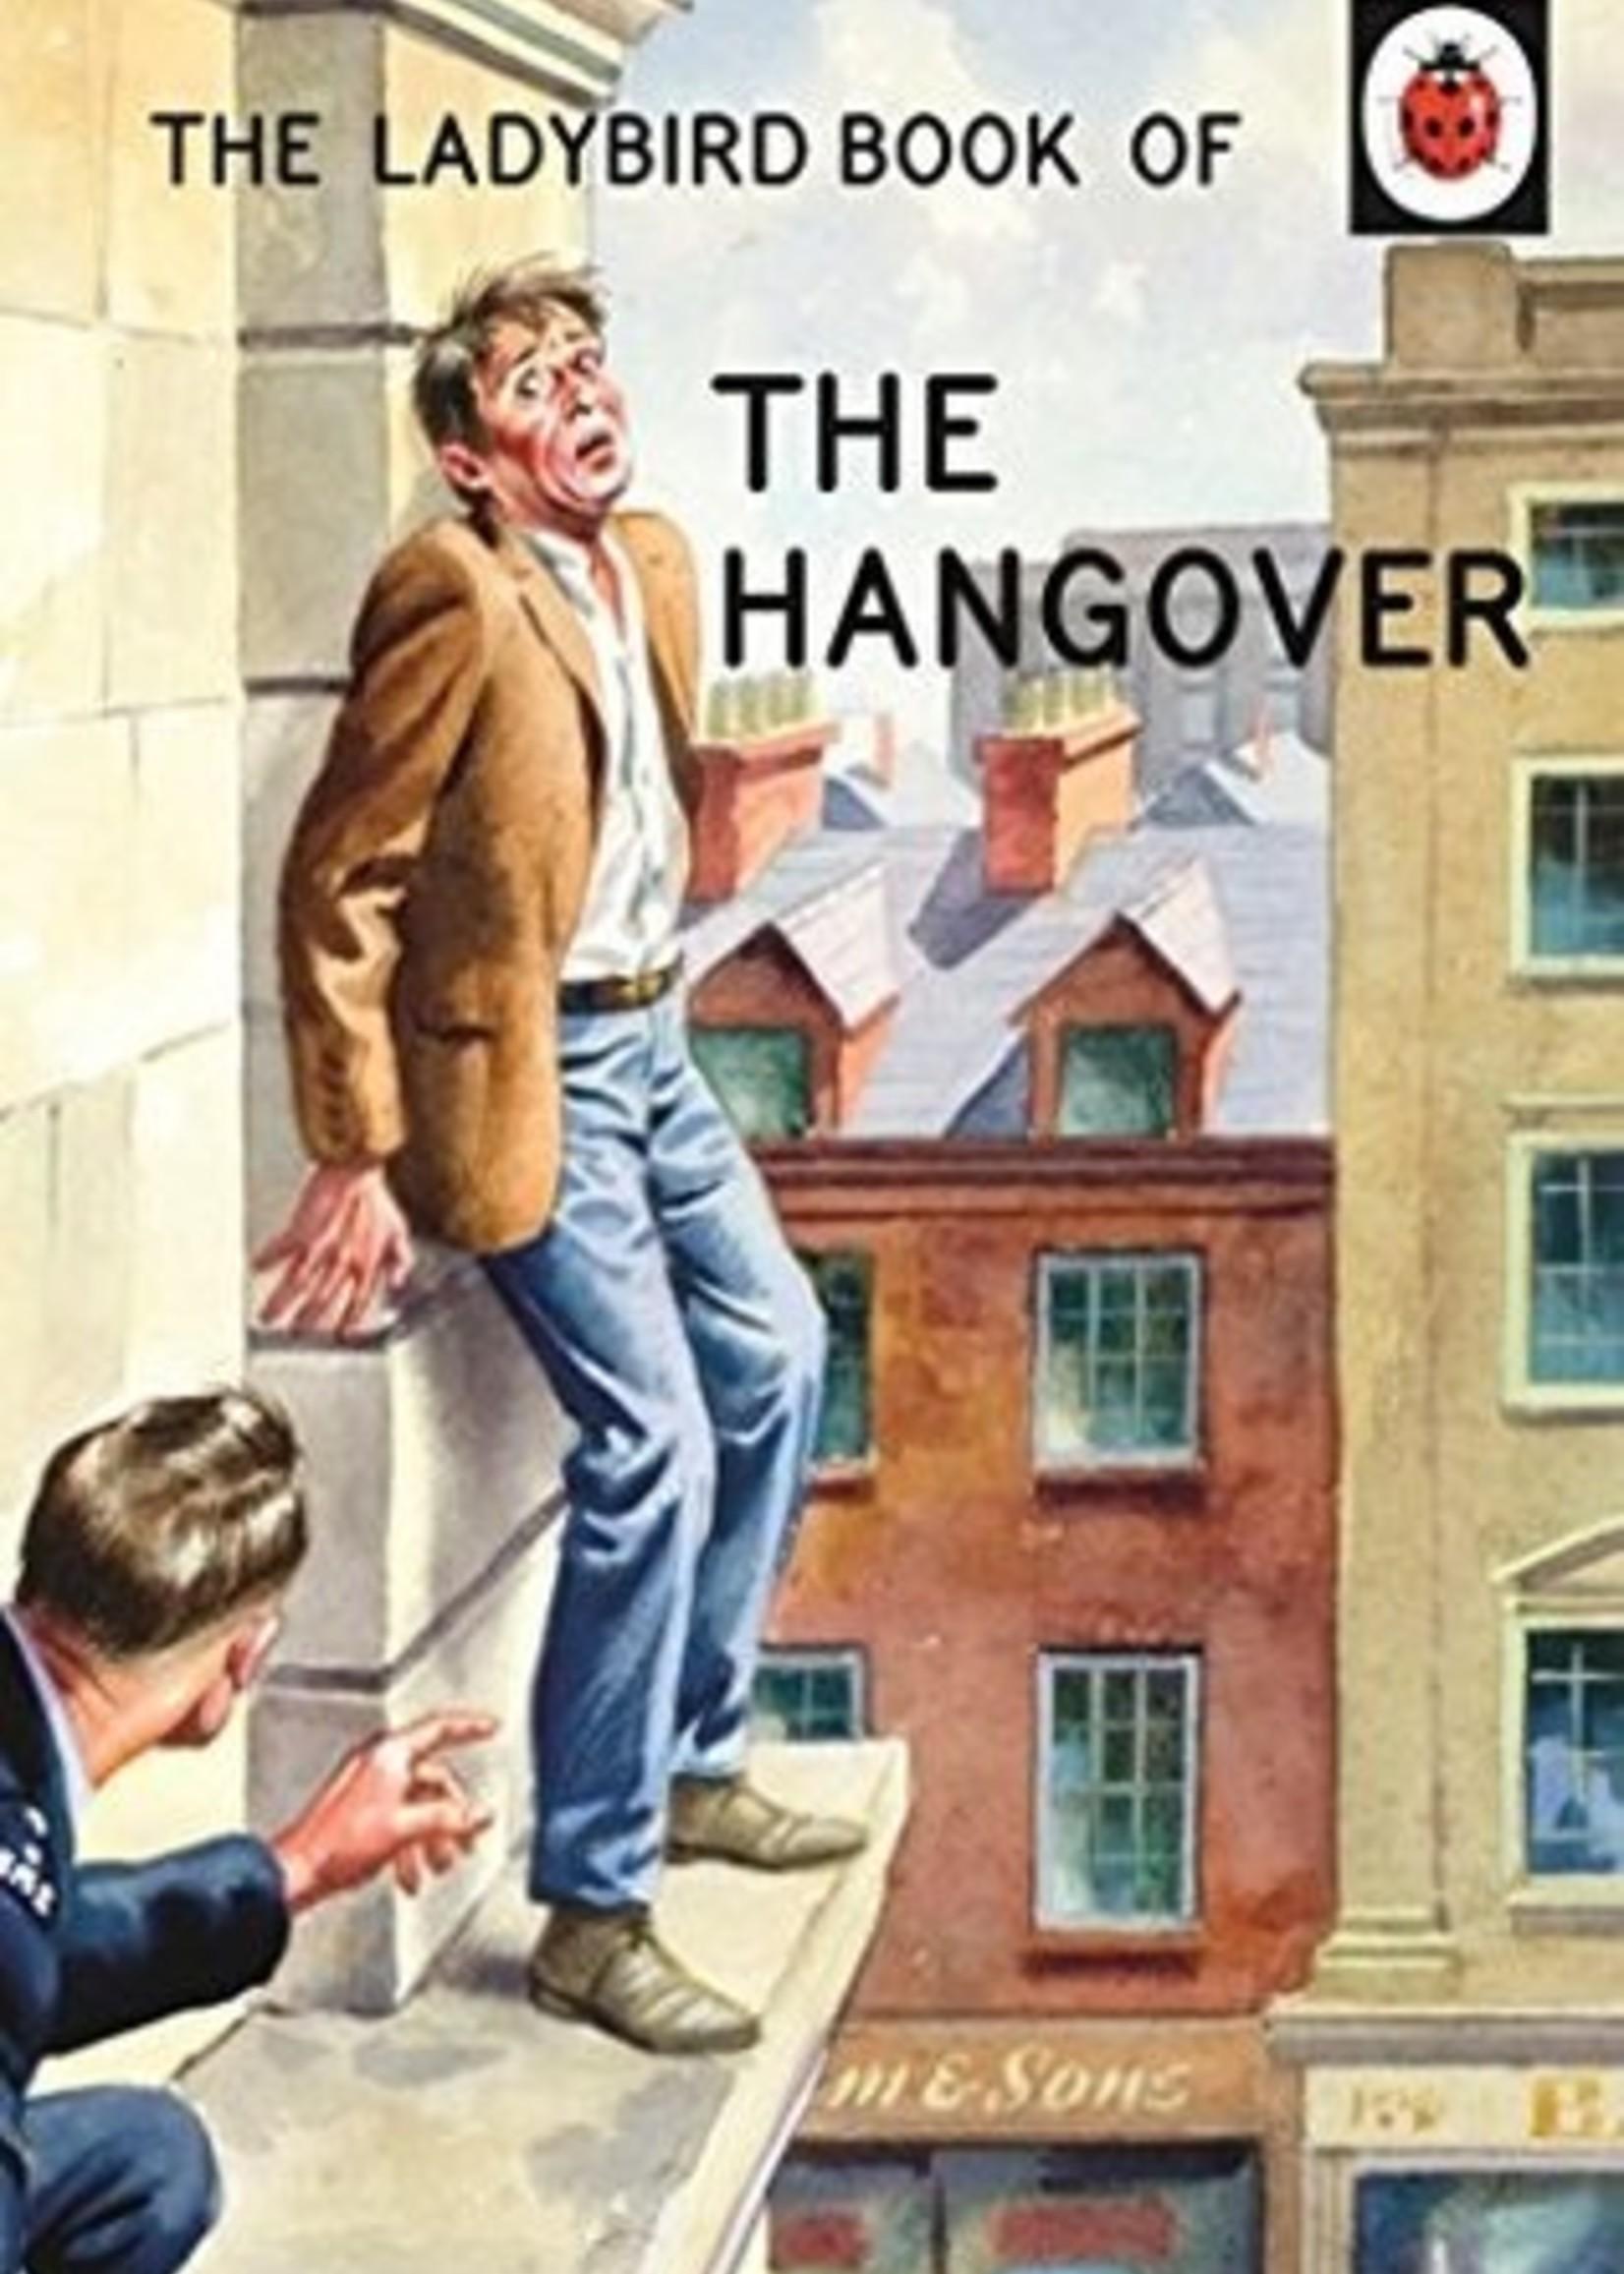 Penguin Random House The Ladybird Book of the Hangover